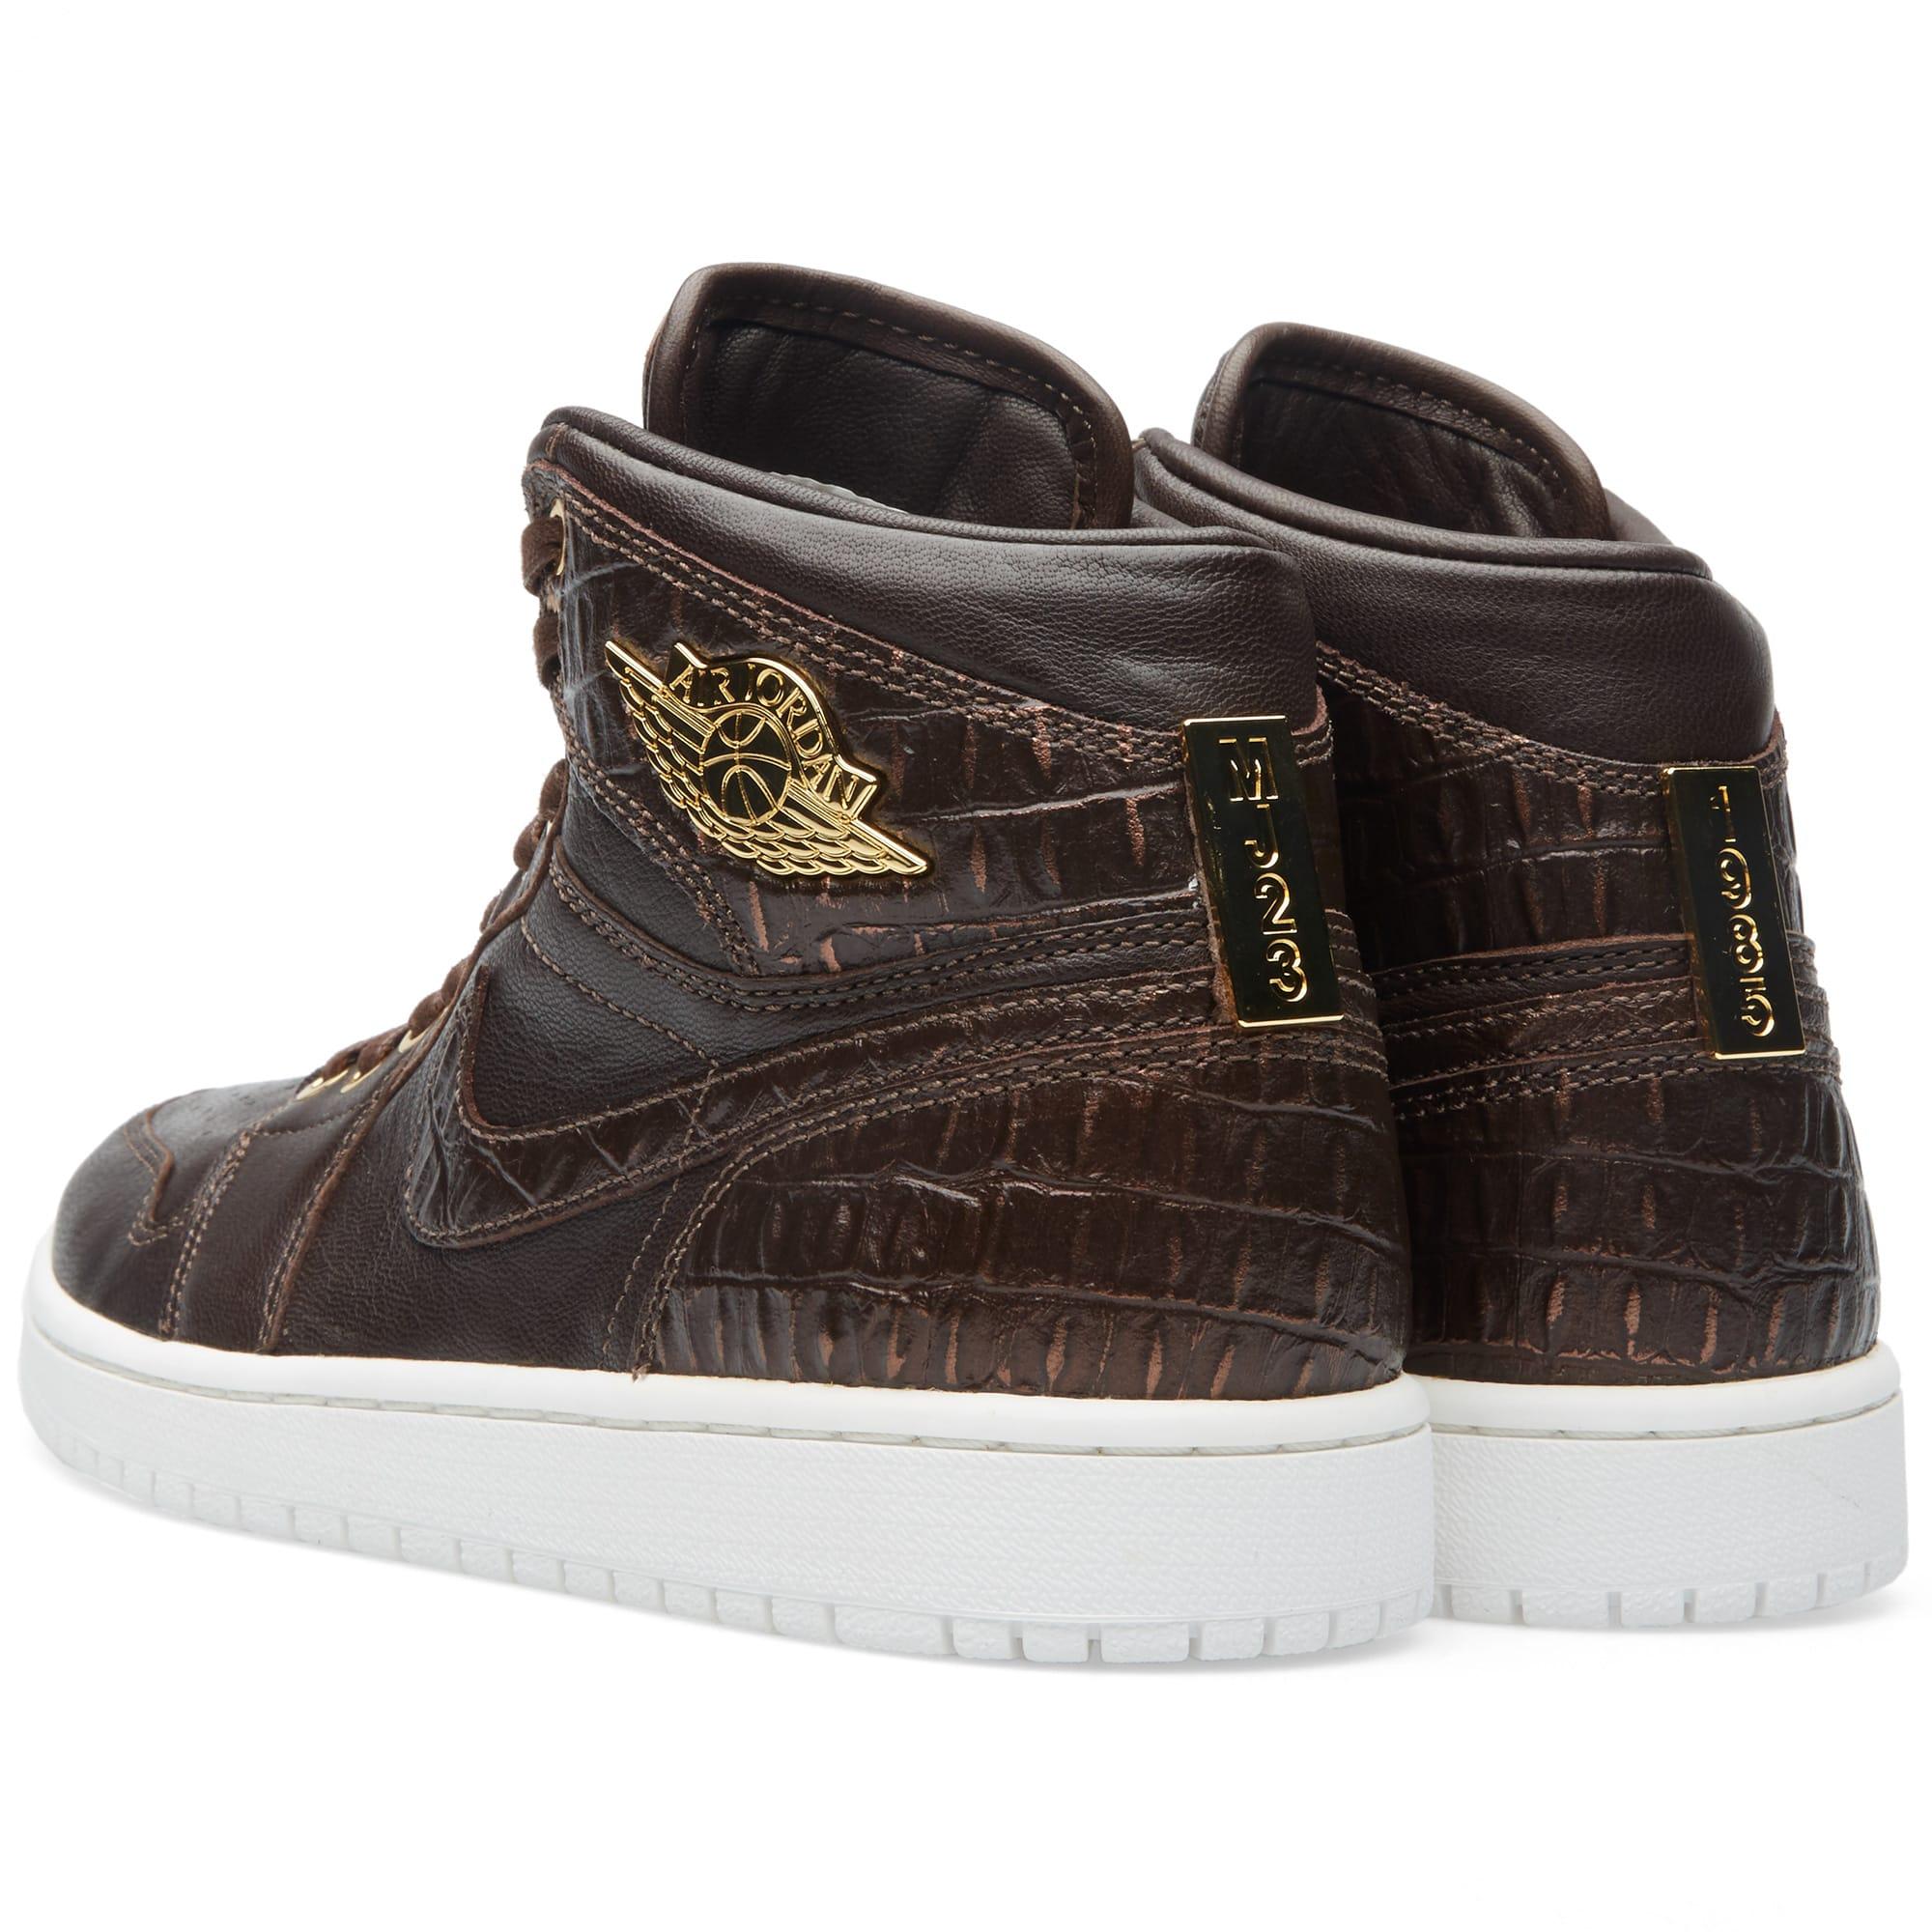 quality design 31356 43fef Nike Air Jordan 1 Pinnacle Baroque Brown   Metallic Gold   END.